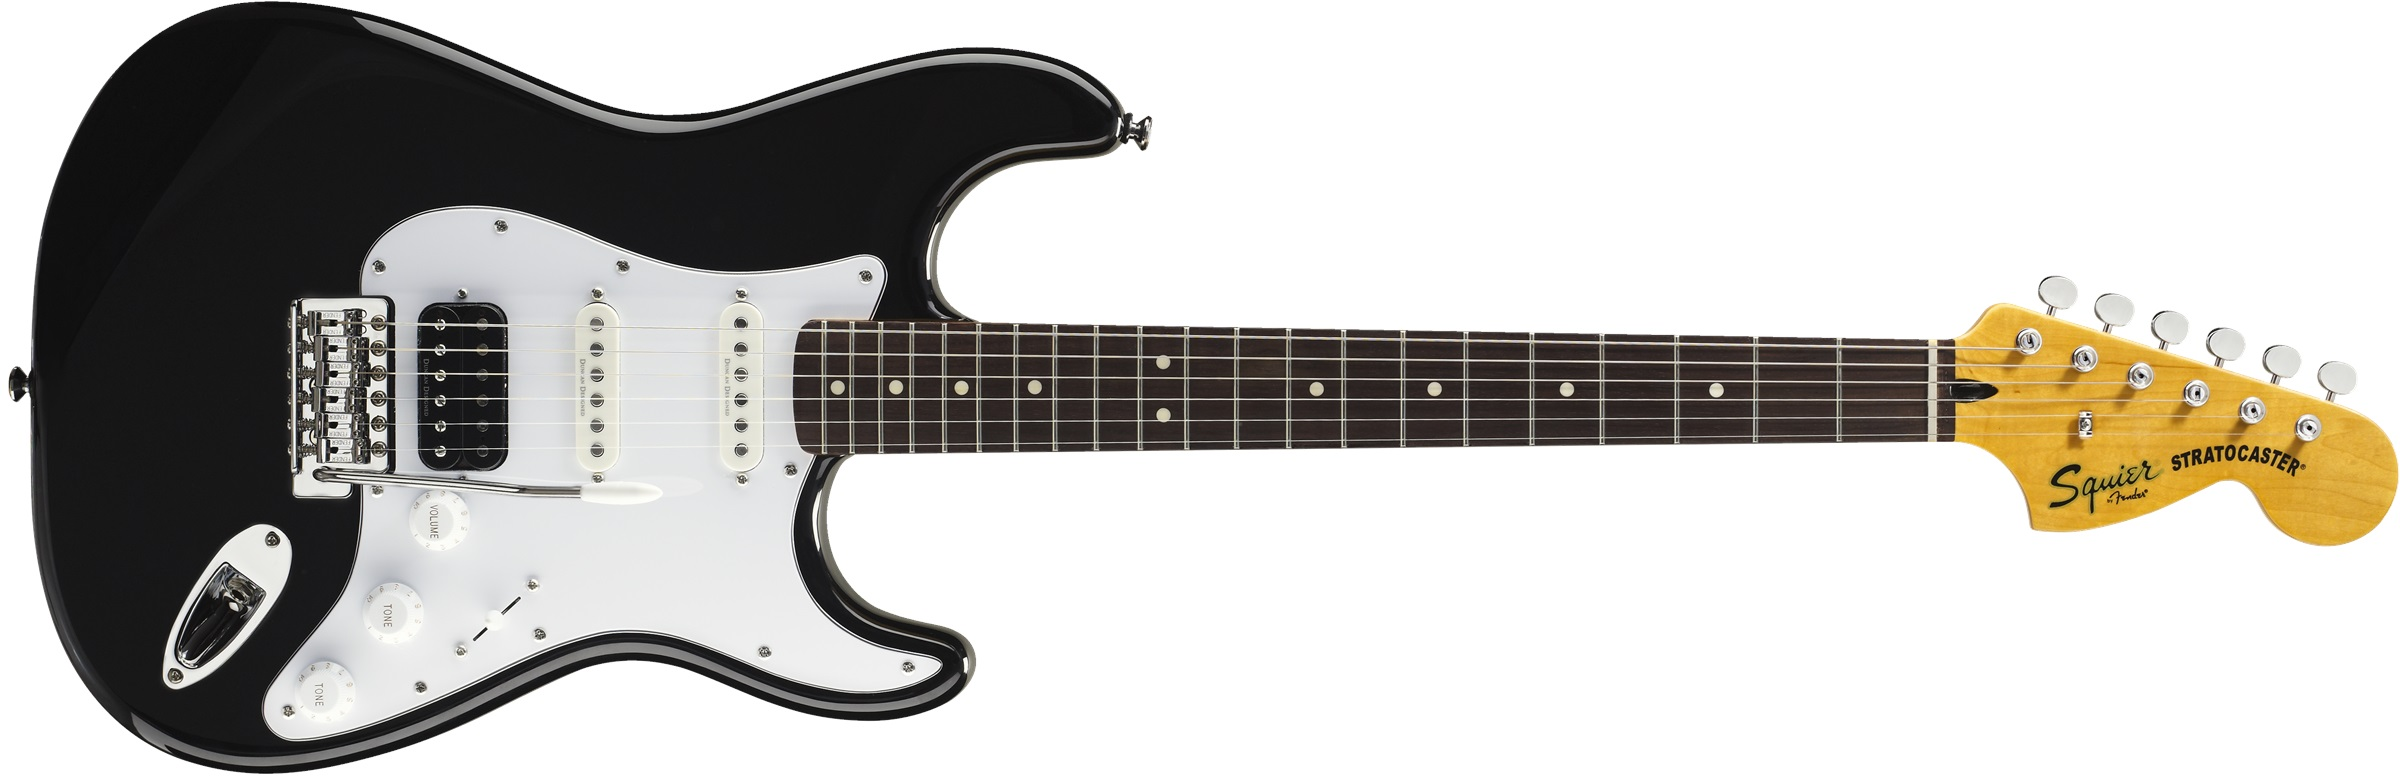 Fender Squier Vintage Modified Stratocaster HSS LRL BK